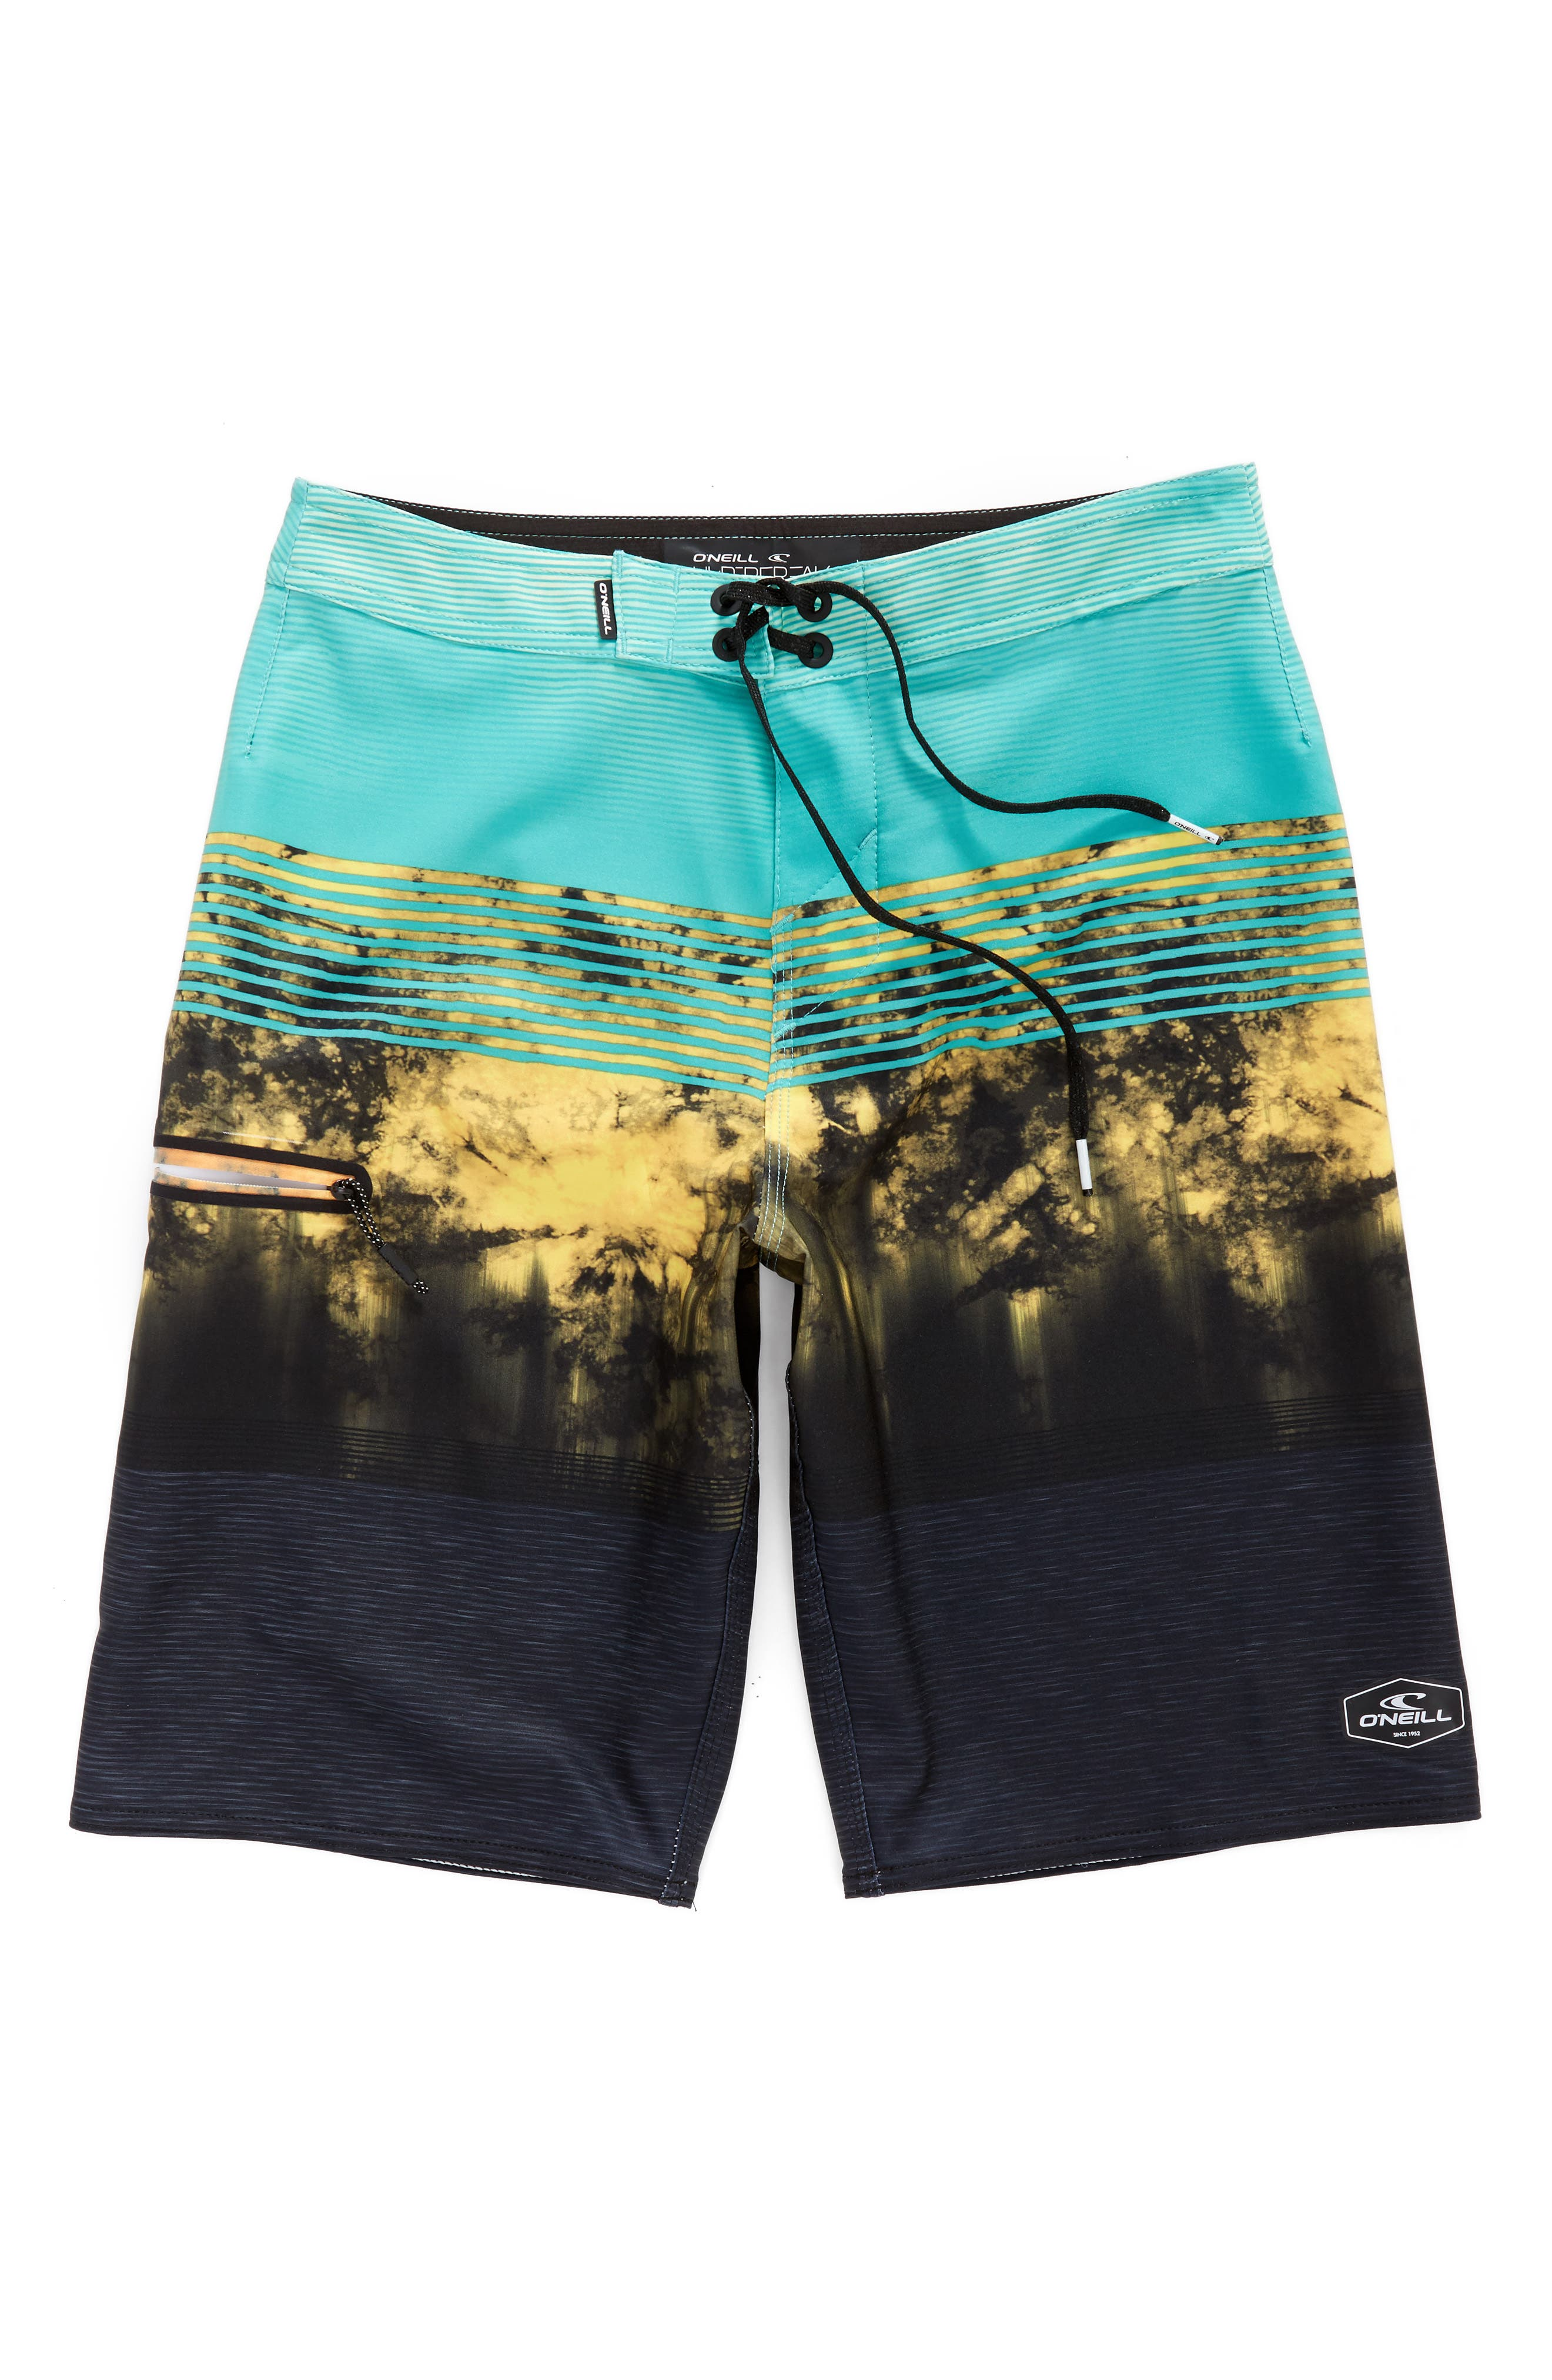 Hyperfreak Board Shorts,                         Main,                         color, AQUA